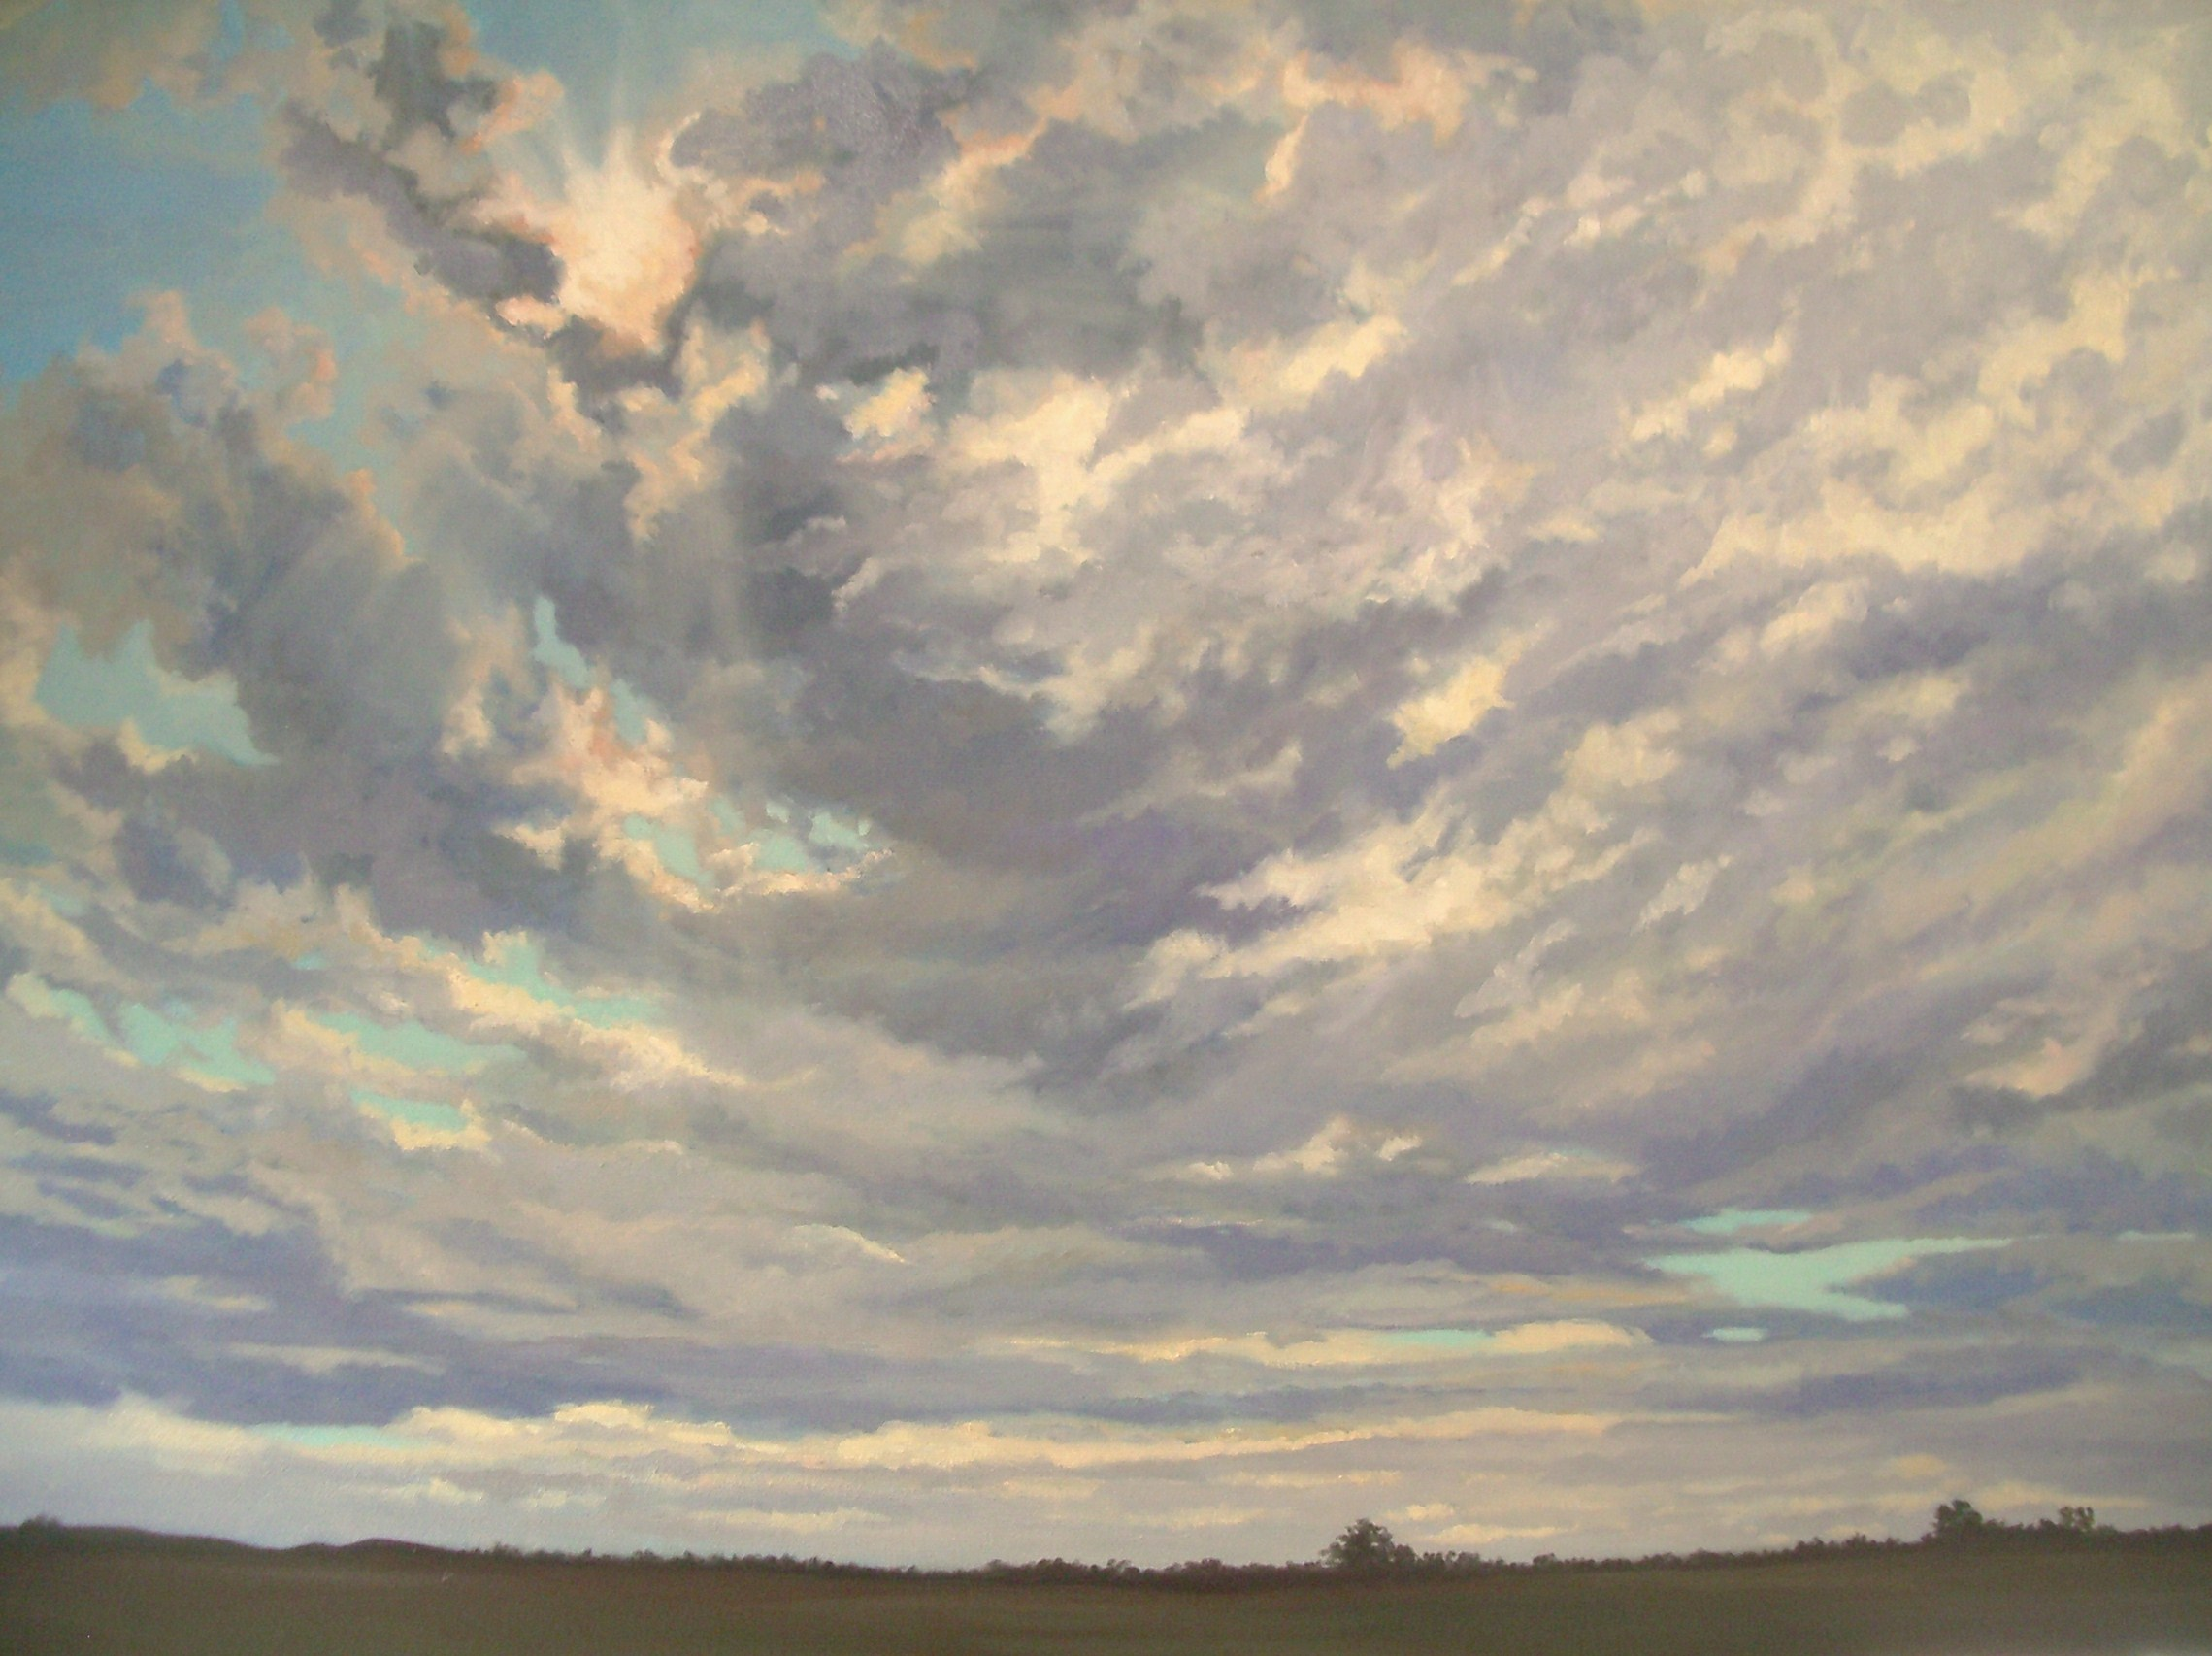 Sky paintings